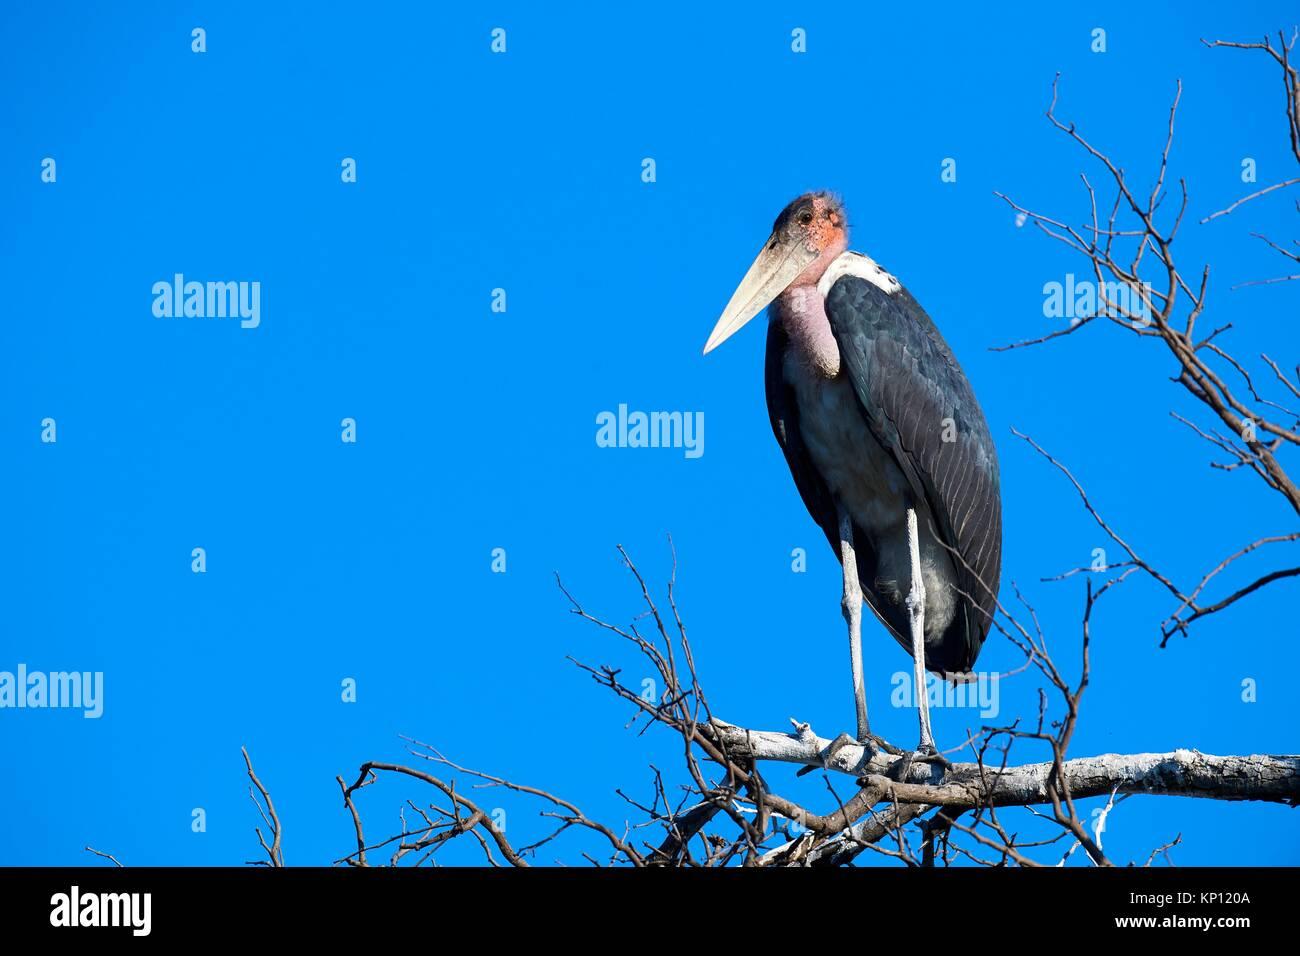 Marabou stork (Milvus aegyptius) appollaiato sul ramo. Moremi National Park, Okavango Delta, Botswana, Sud Africa. Immagini Stock